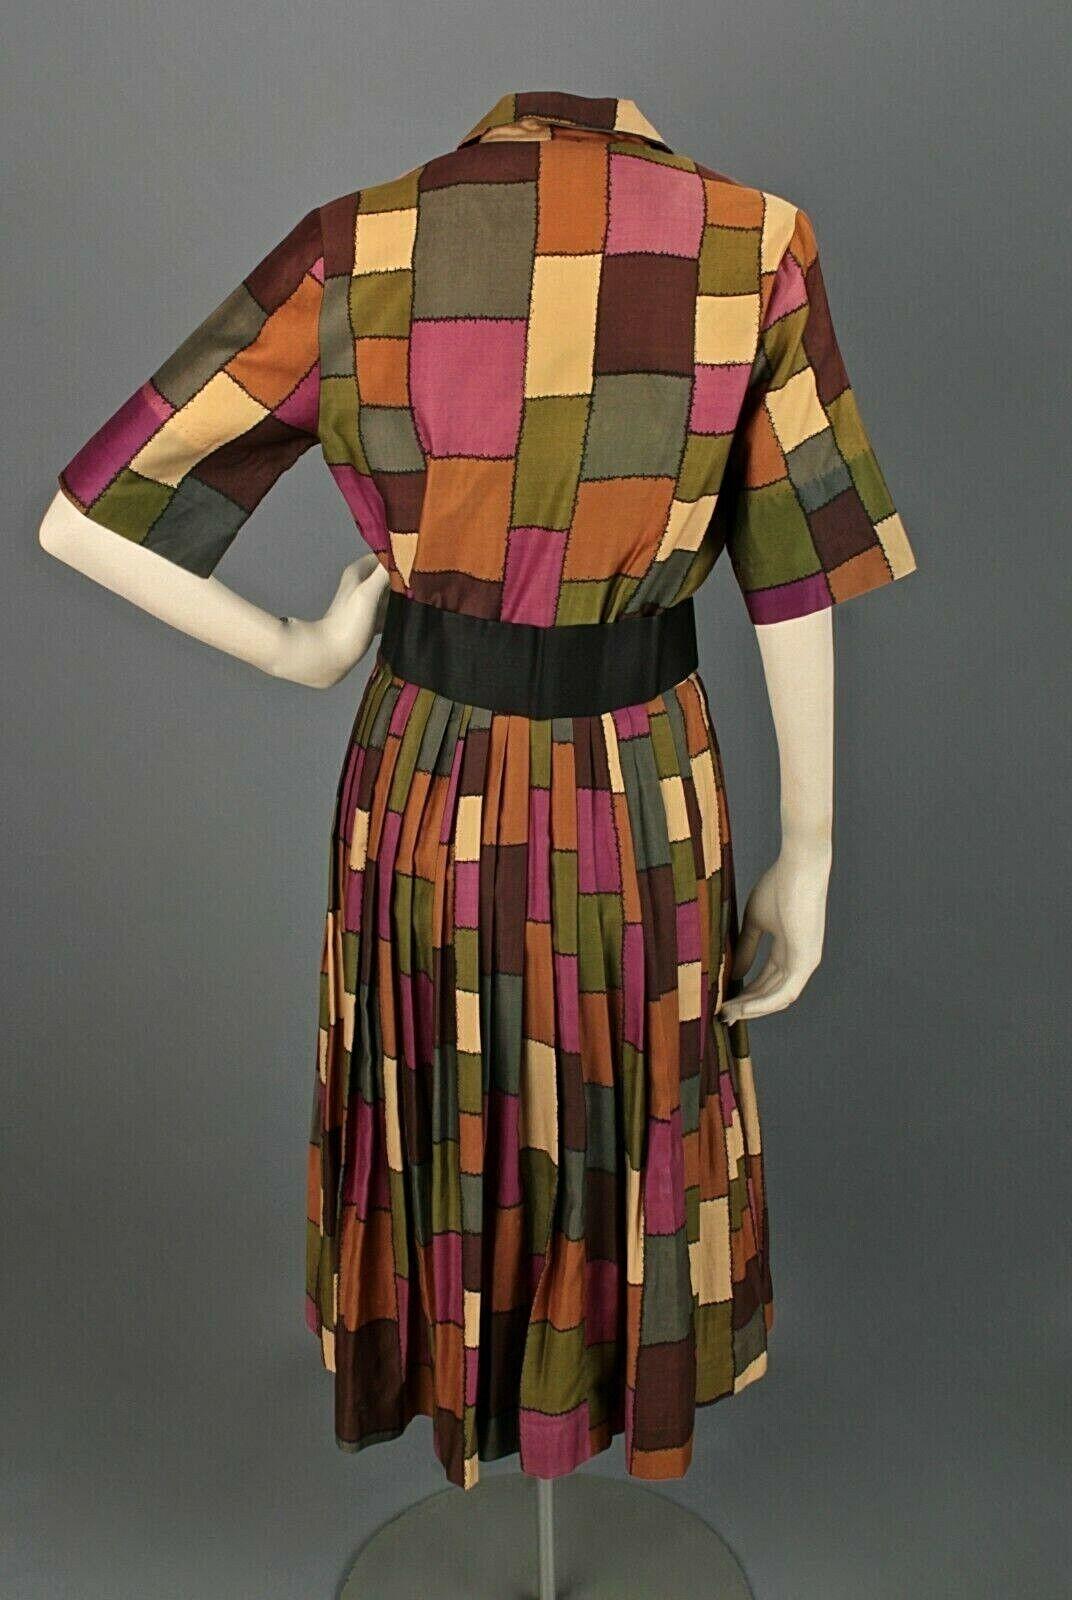 VTG Women's 50s 60s Patchwork Print Shirtwaist Dr… - image 3